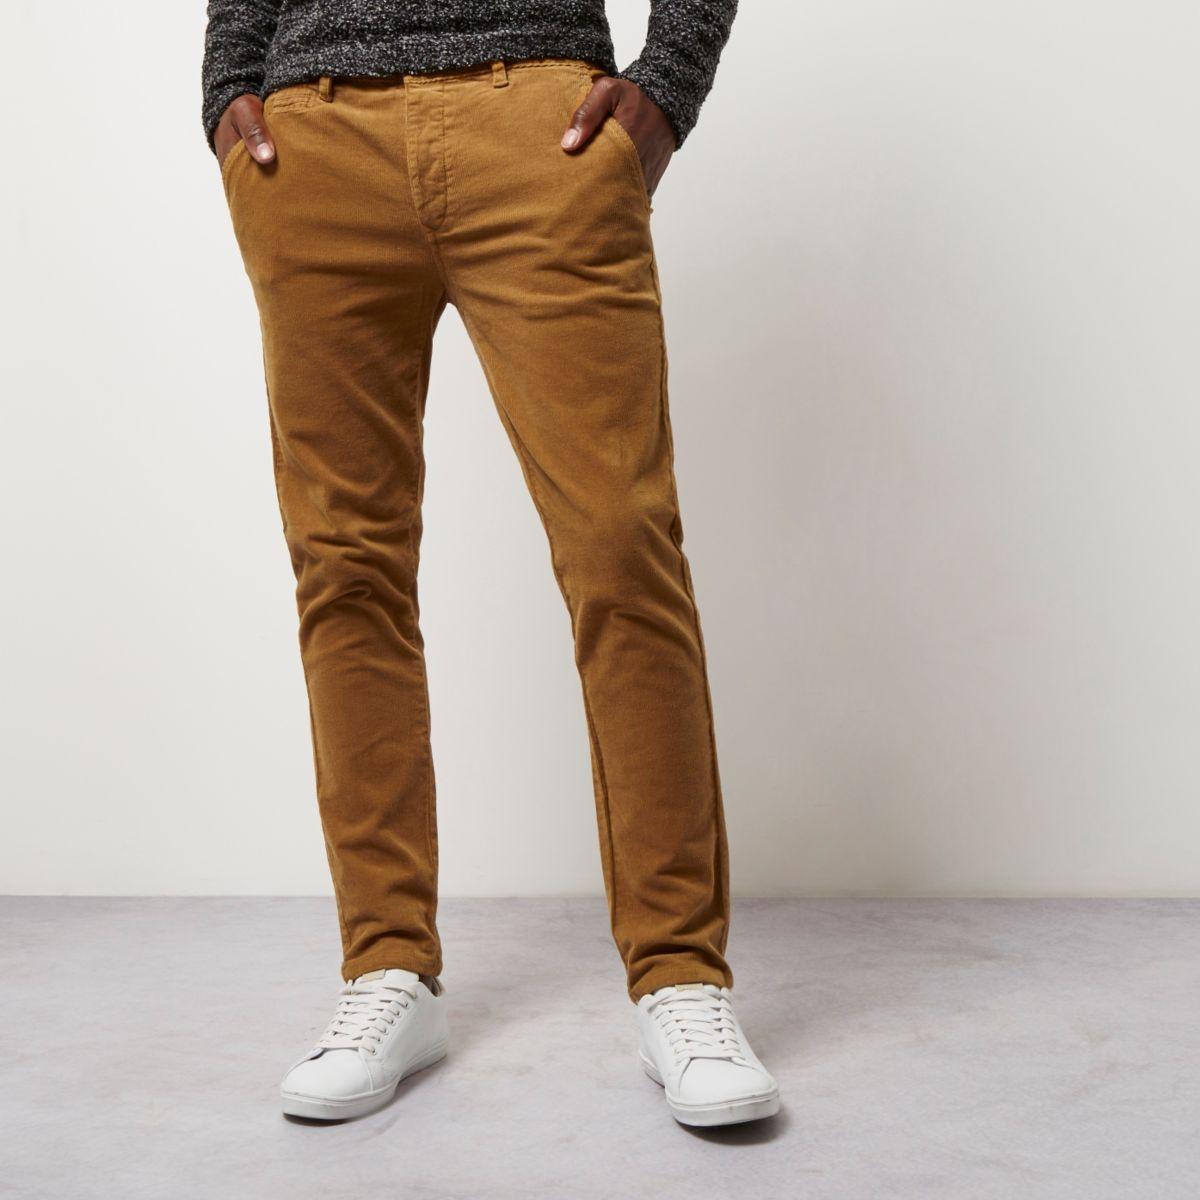 Camel skinny corduroy chino trousers